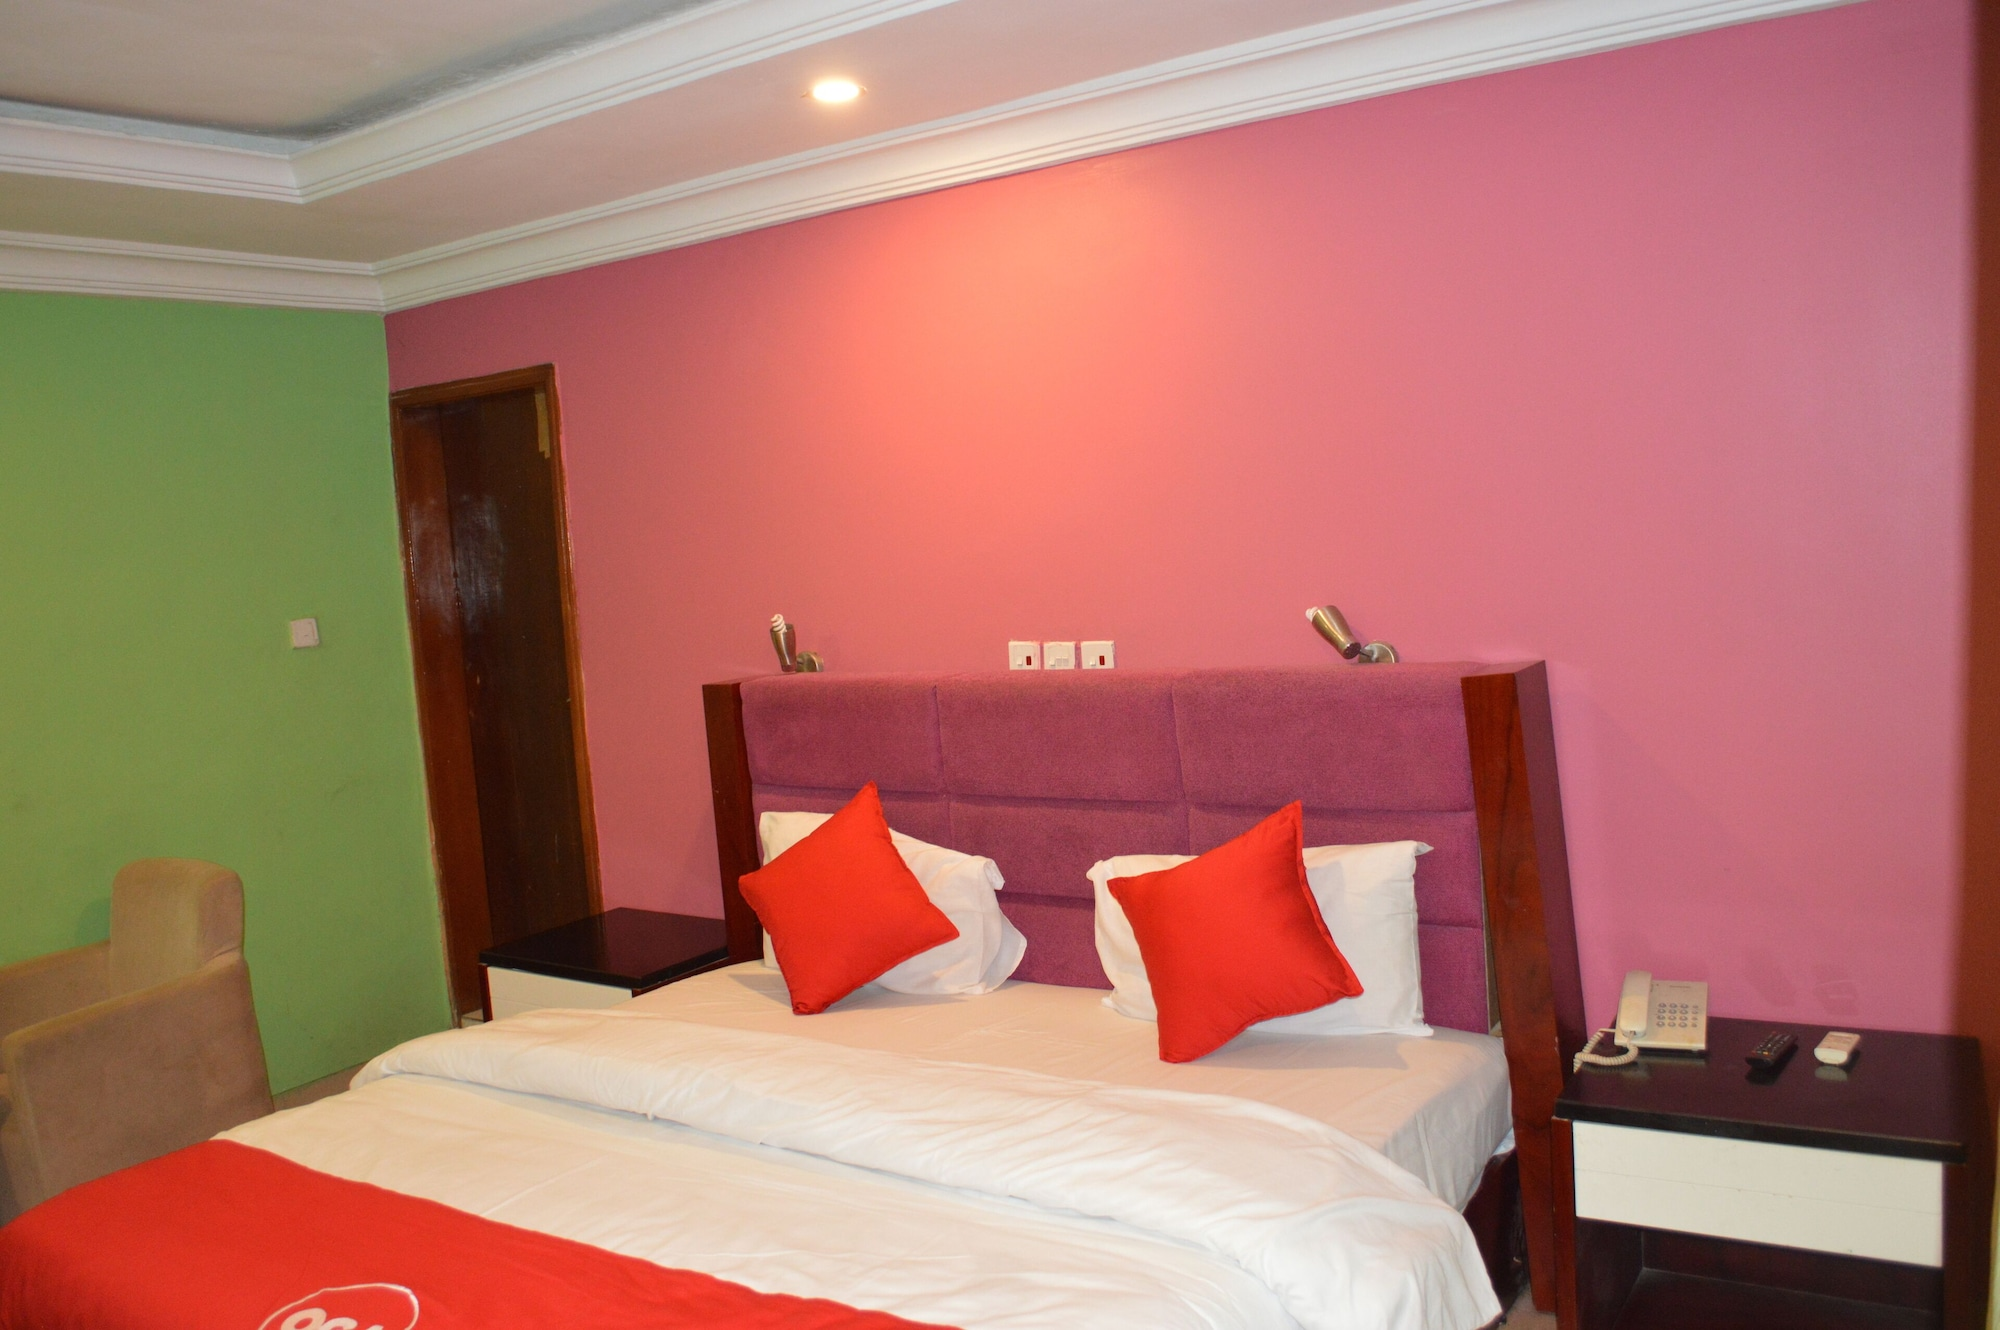 OGA 813 Hotel, Apapa